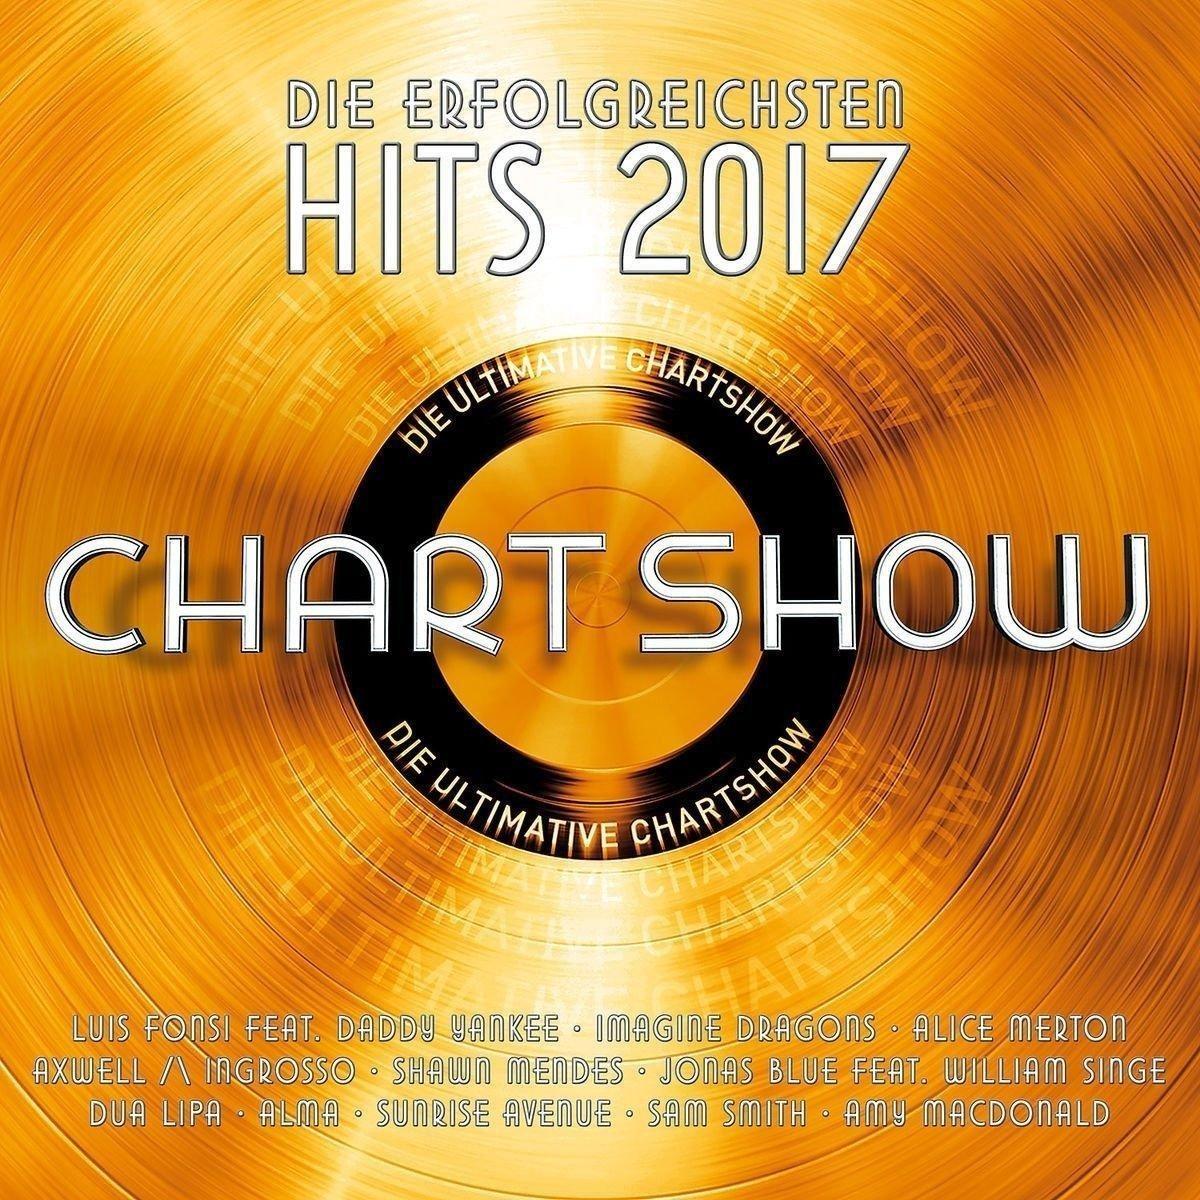 VA - Die Ultimative Chartshow Die..<br>Die Ultimative Chartshow Die Erfolgreichsten Hits 2017 (2017) [FLAC] Download